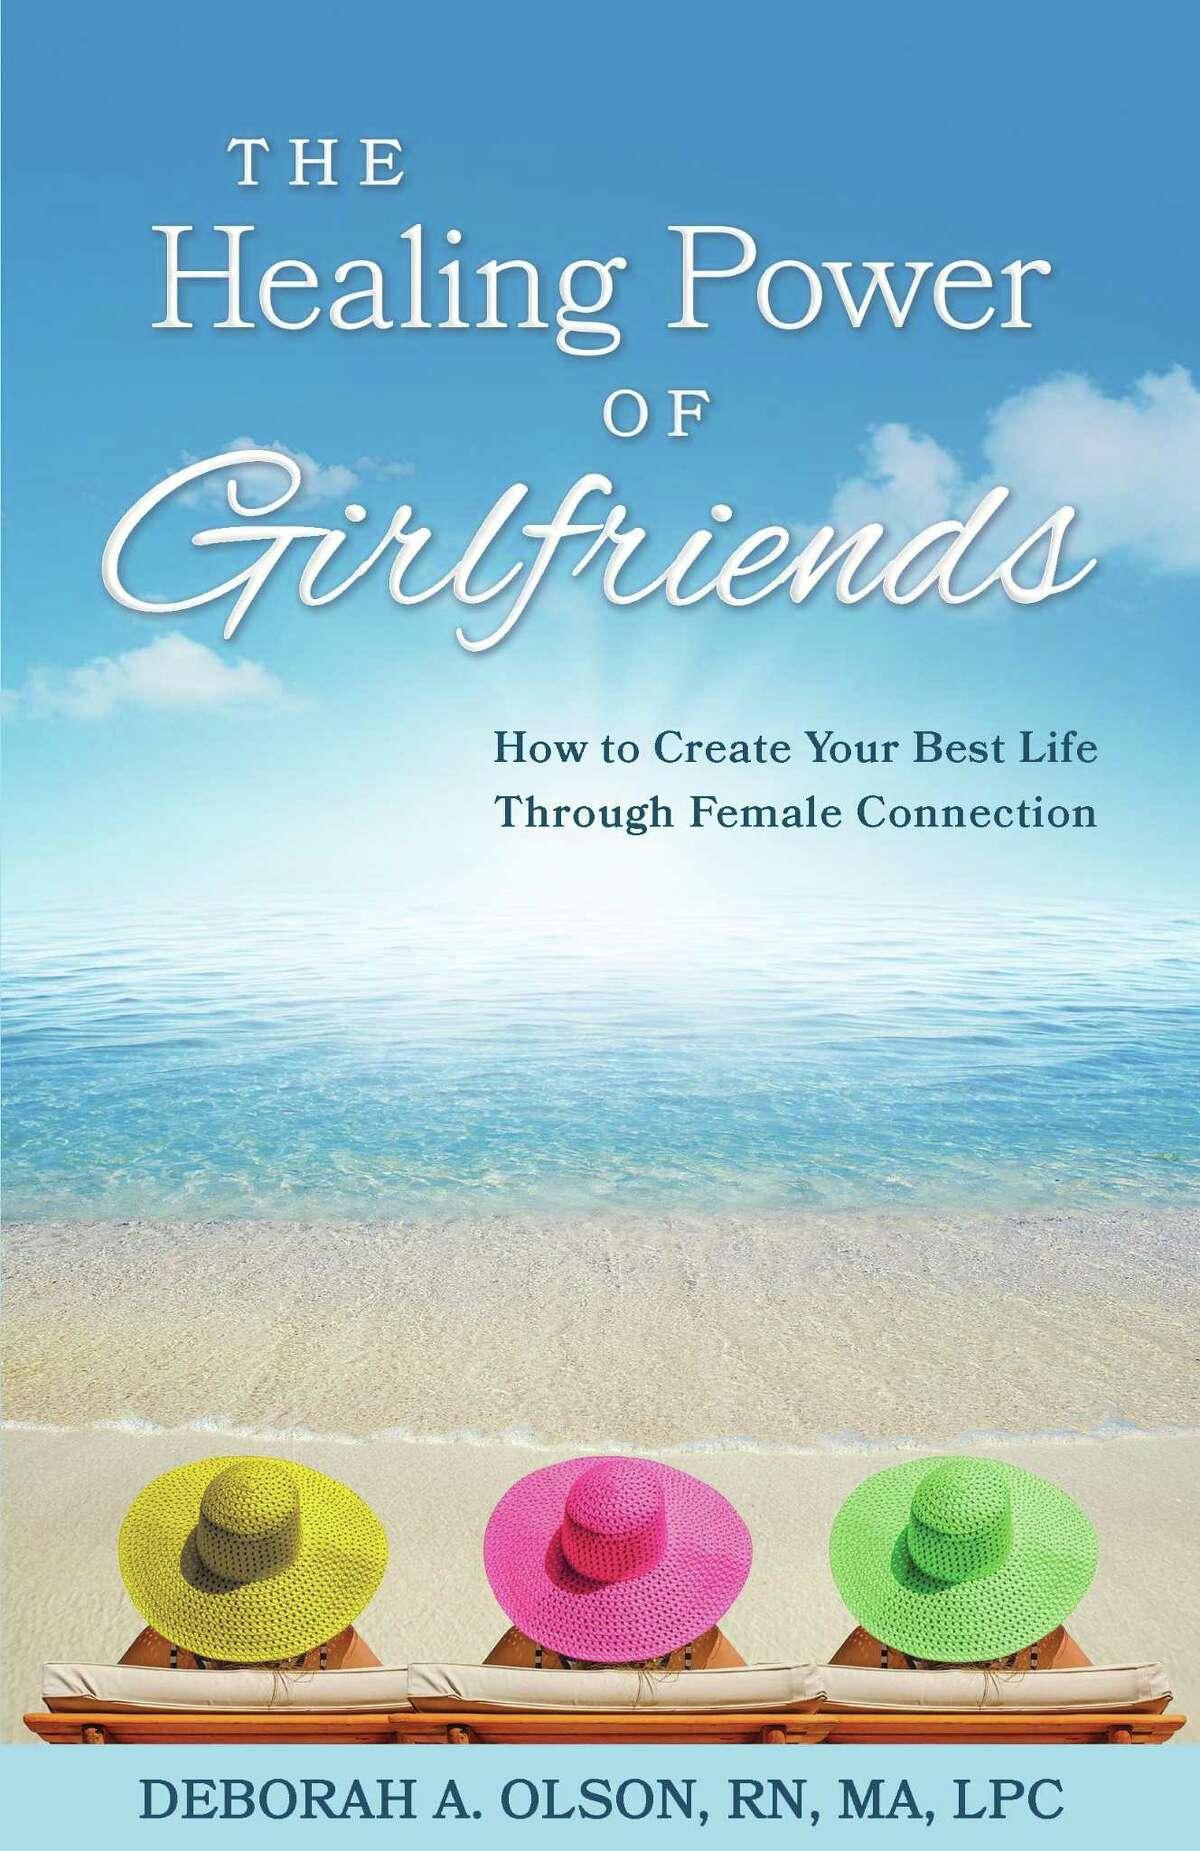 Deborah Olson of Houston has recently authored the book